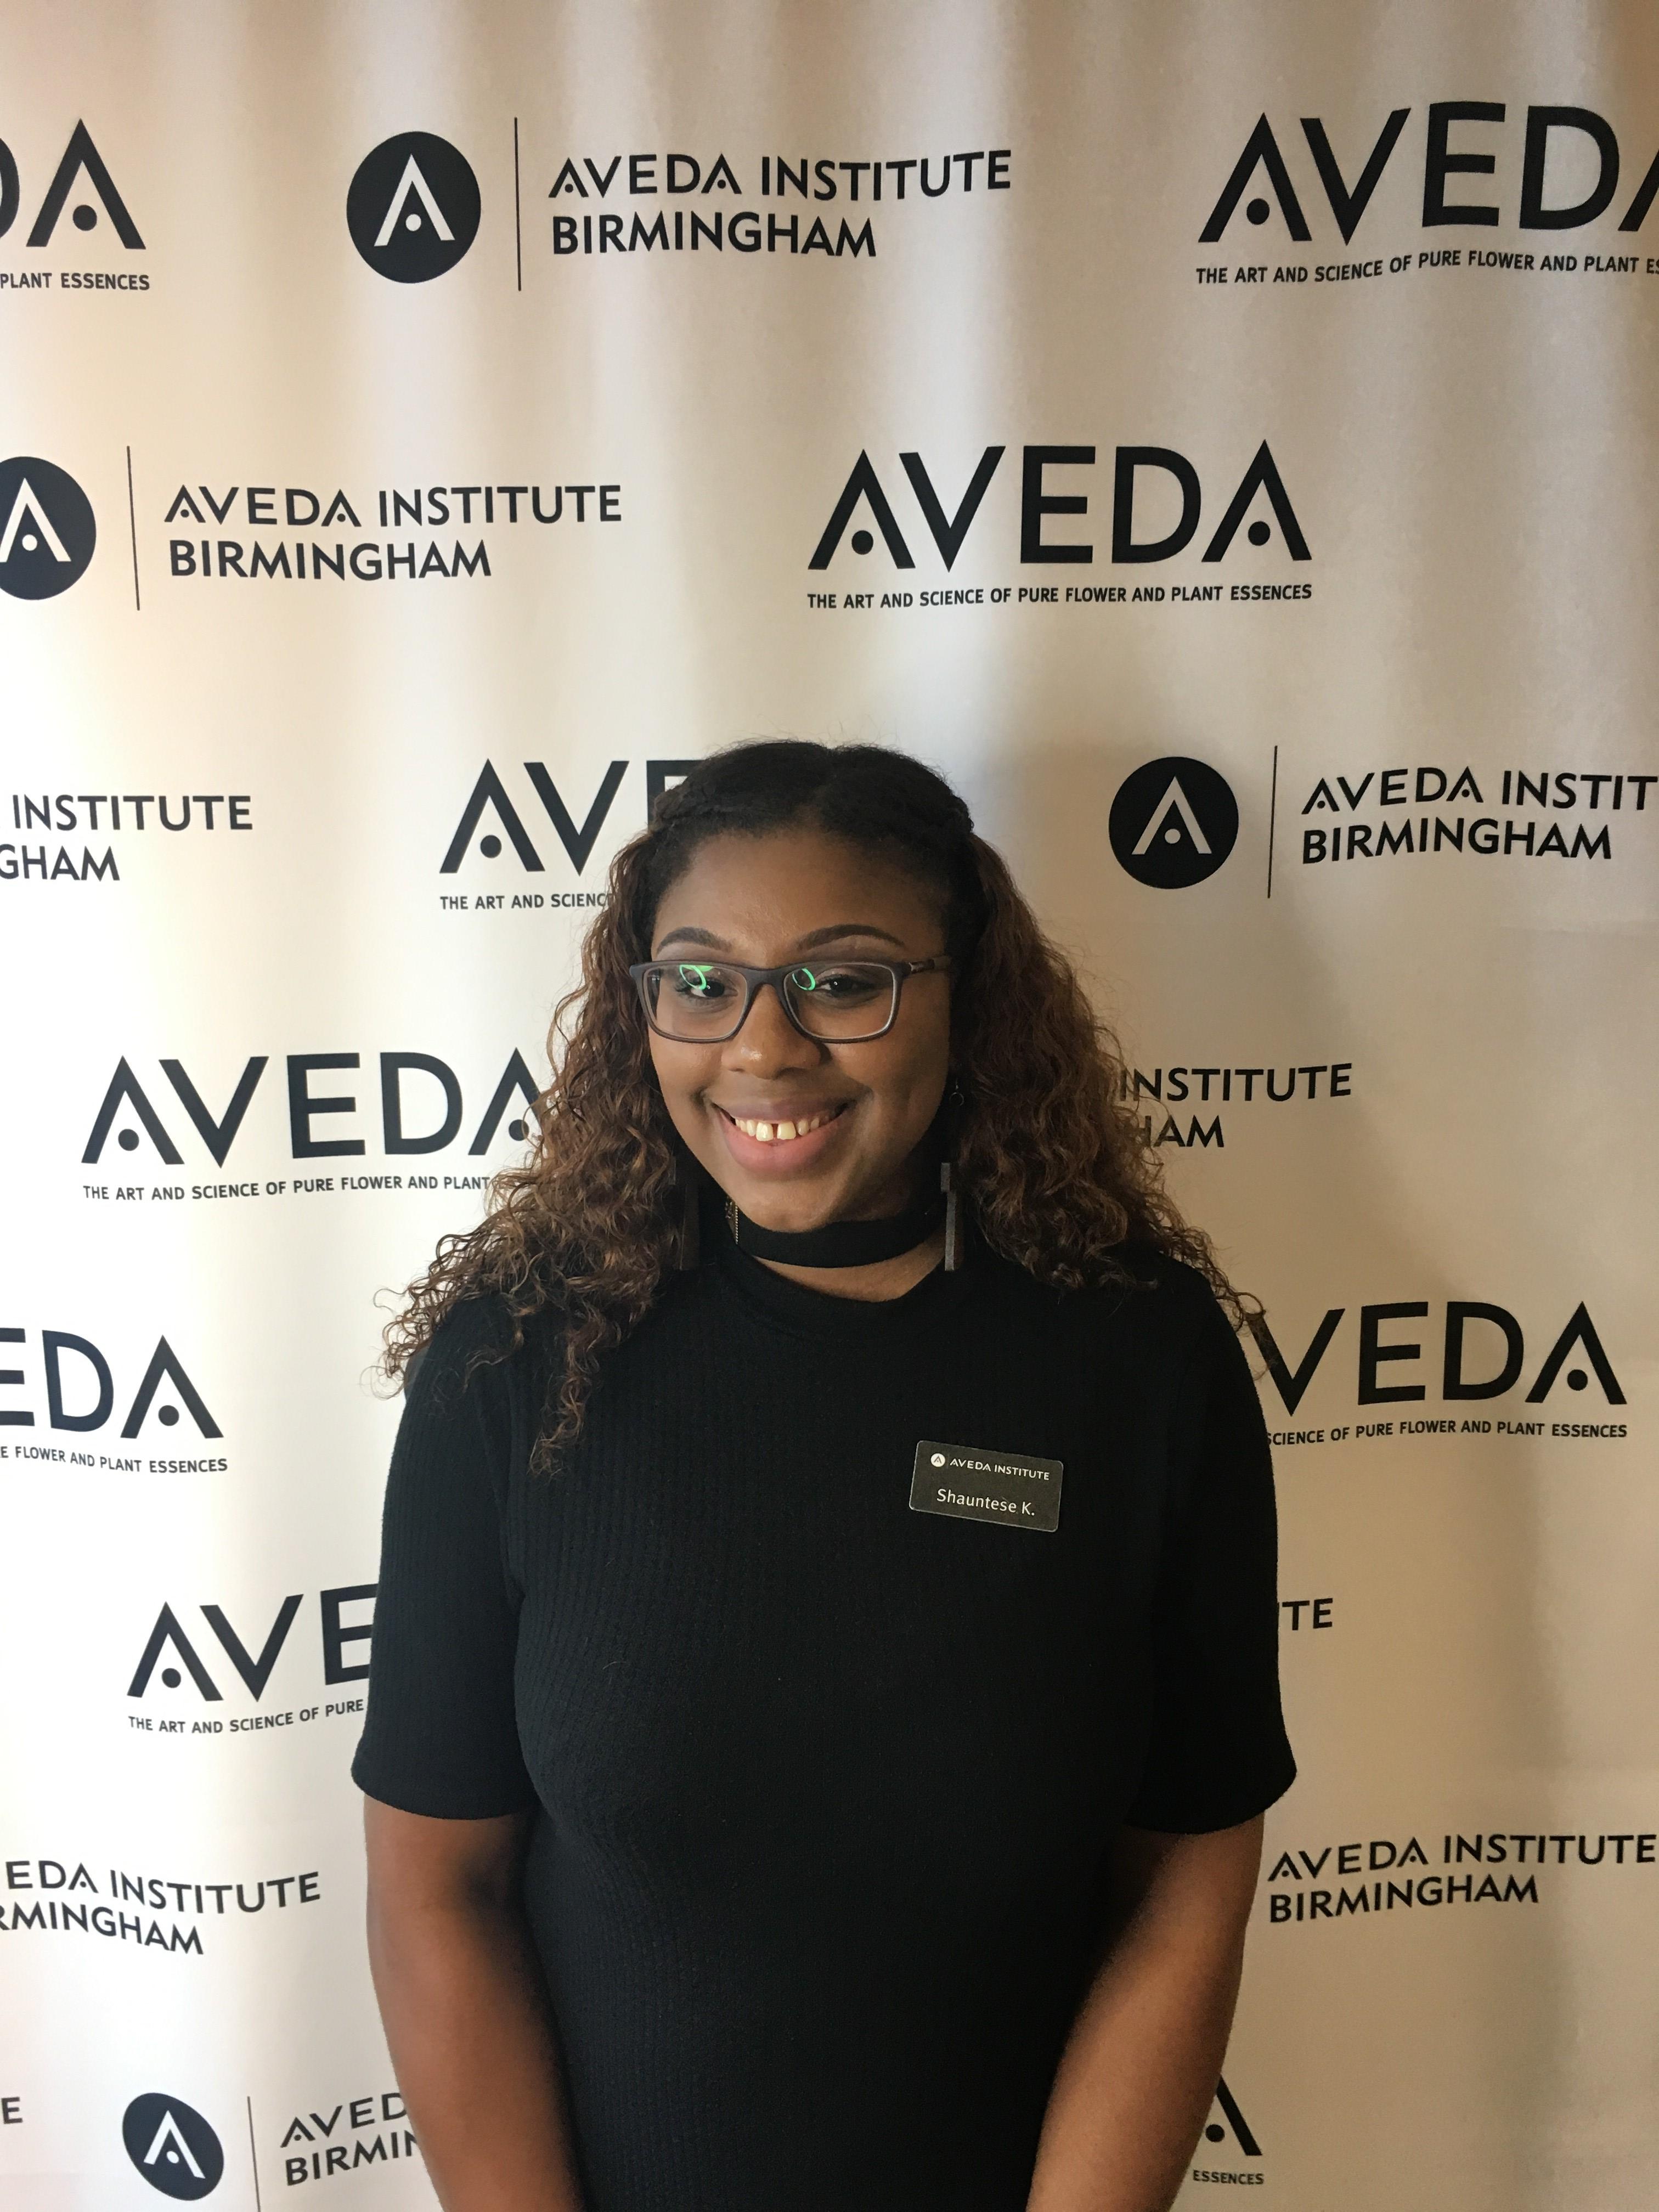 Image of Aveda Birmingham Student